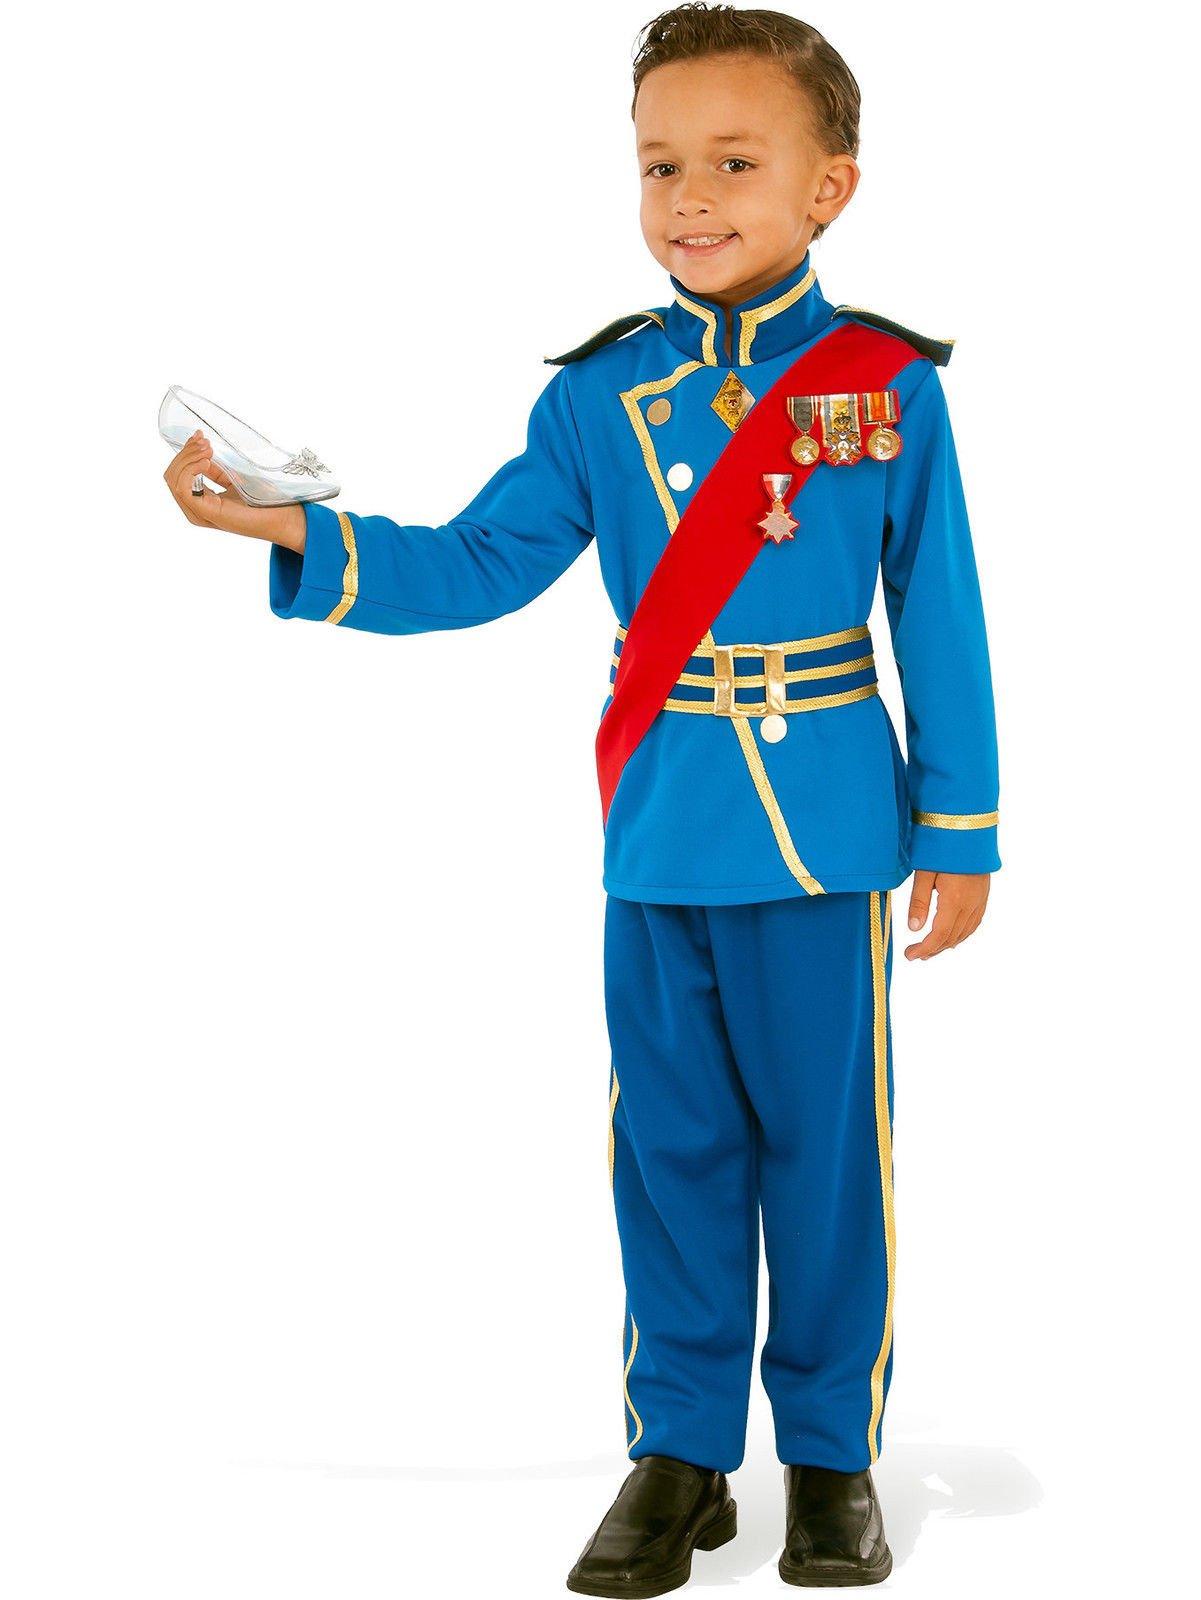 Adorable Royal Prince Boys Blue Charming Fairytale Costume Jacket Pants SM-LG